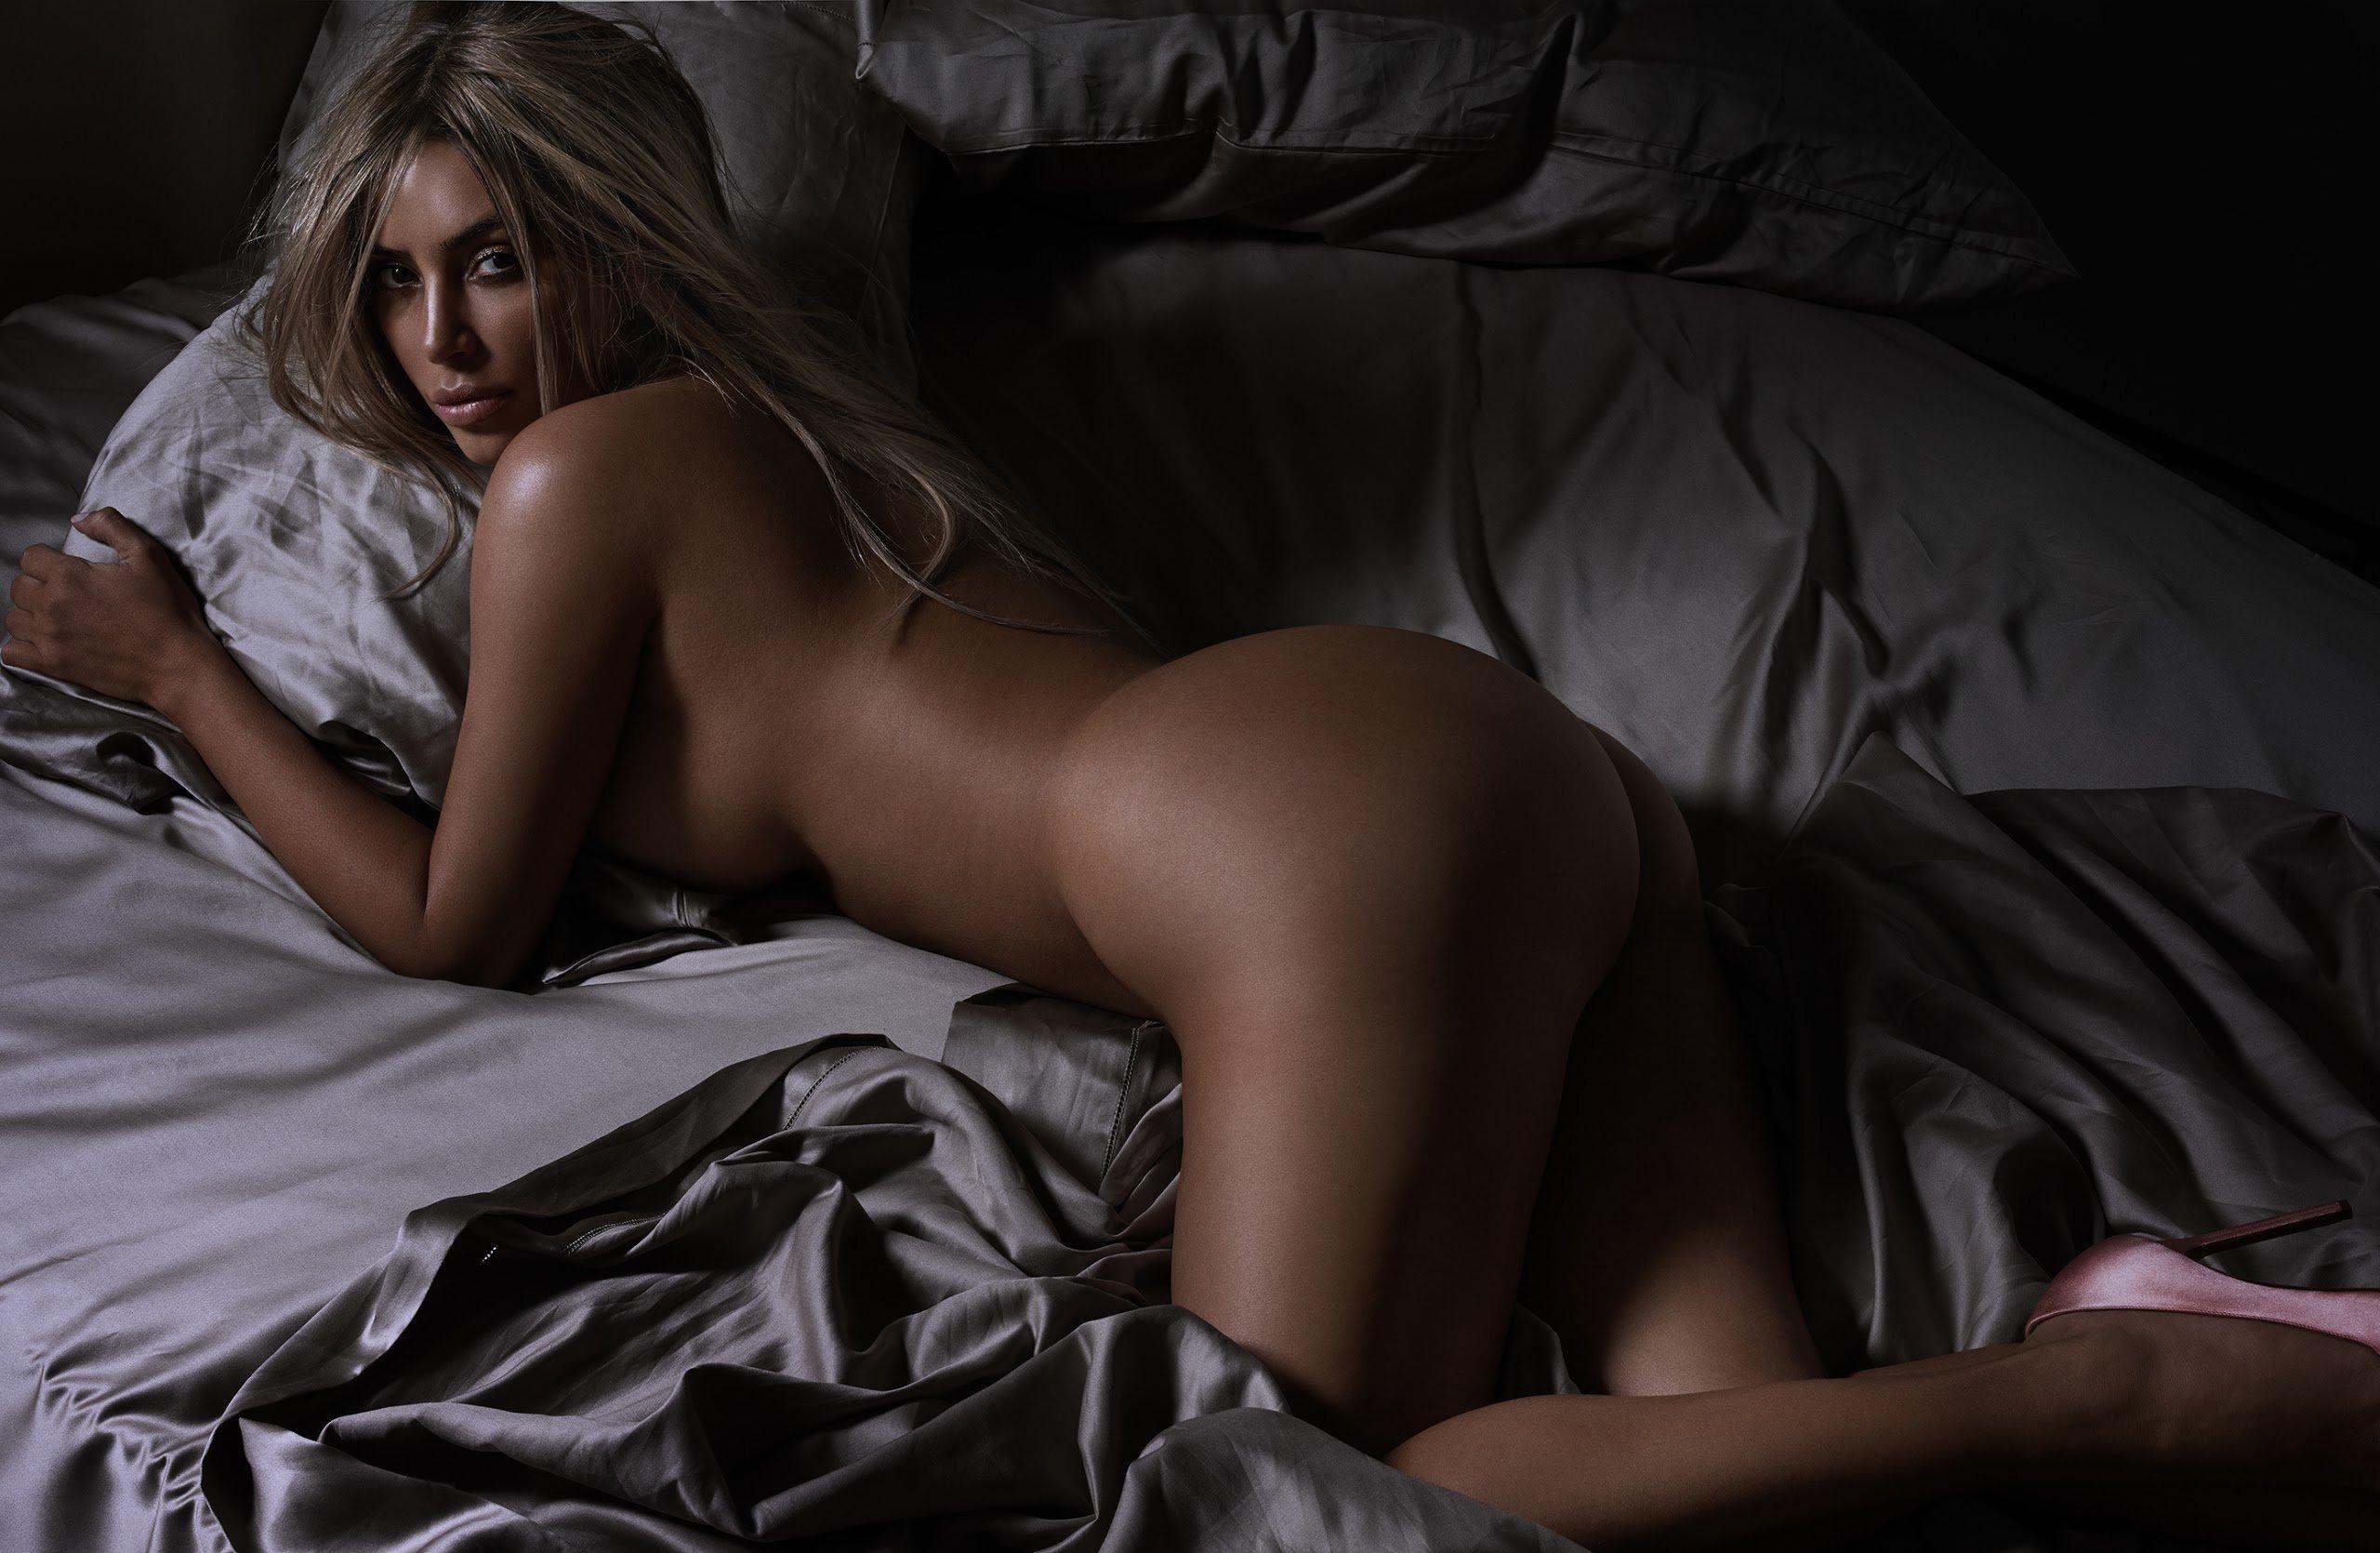 kim-kardashian-shows-her-pussy-pic-men-webcam-hunks